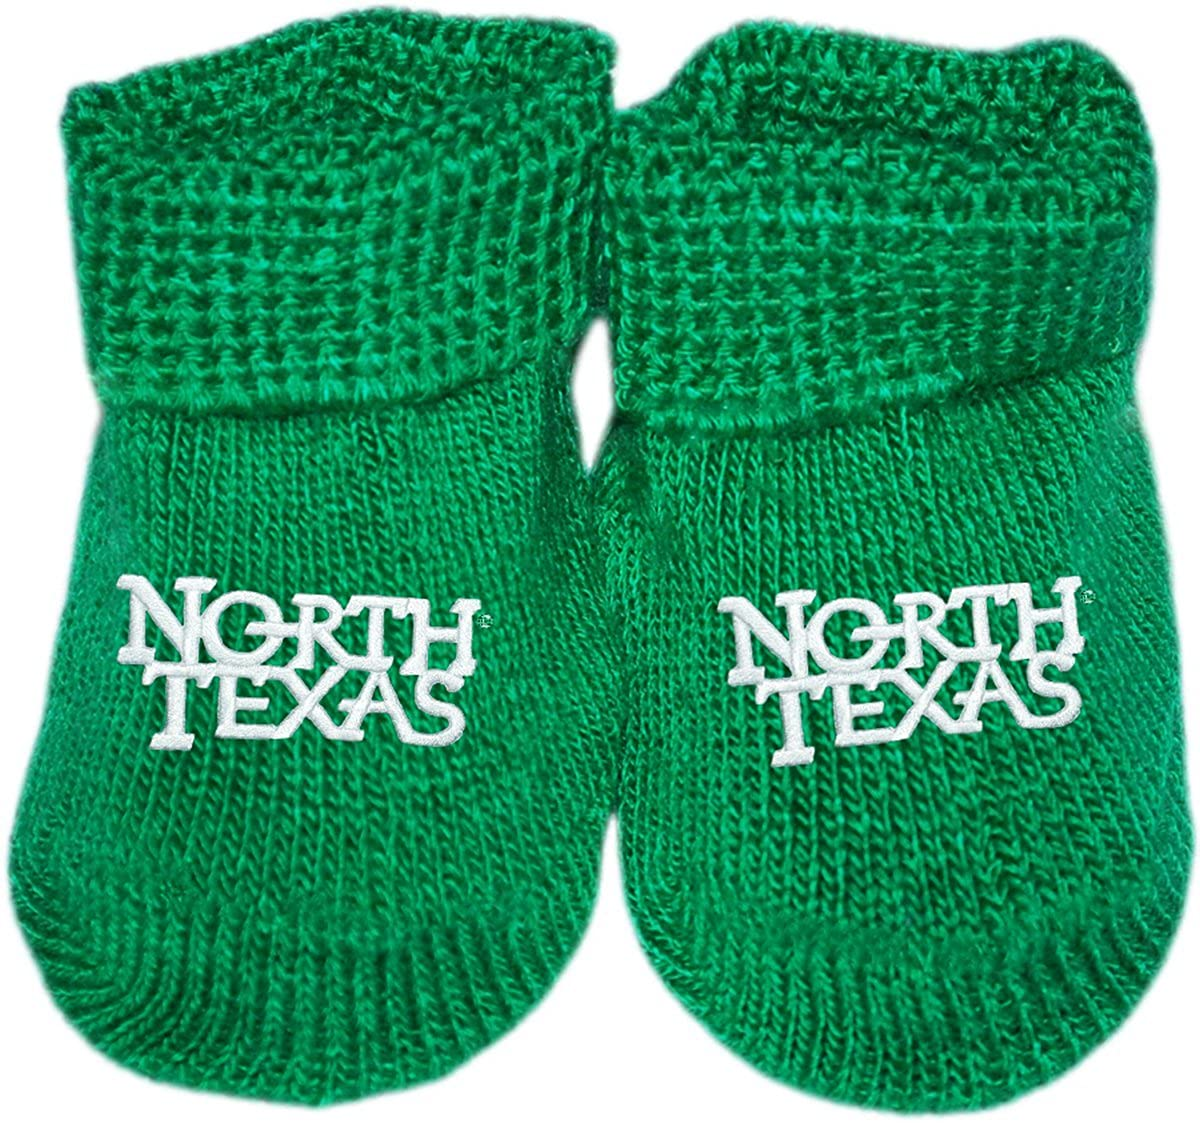 University of North Texas Newborn Baby Bootie Sock